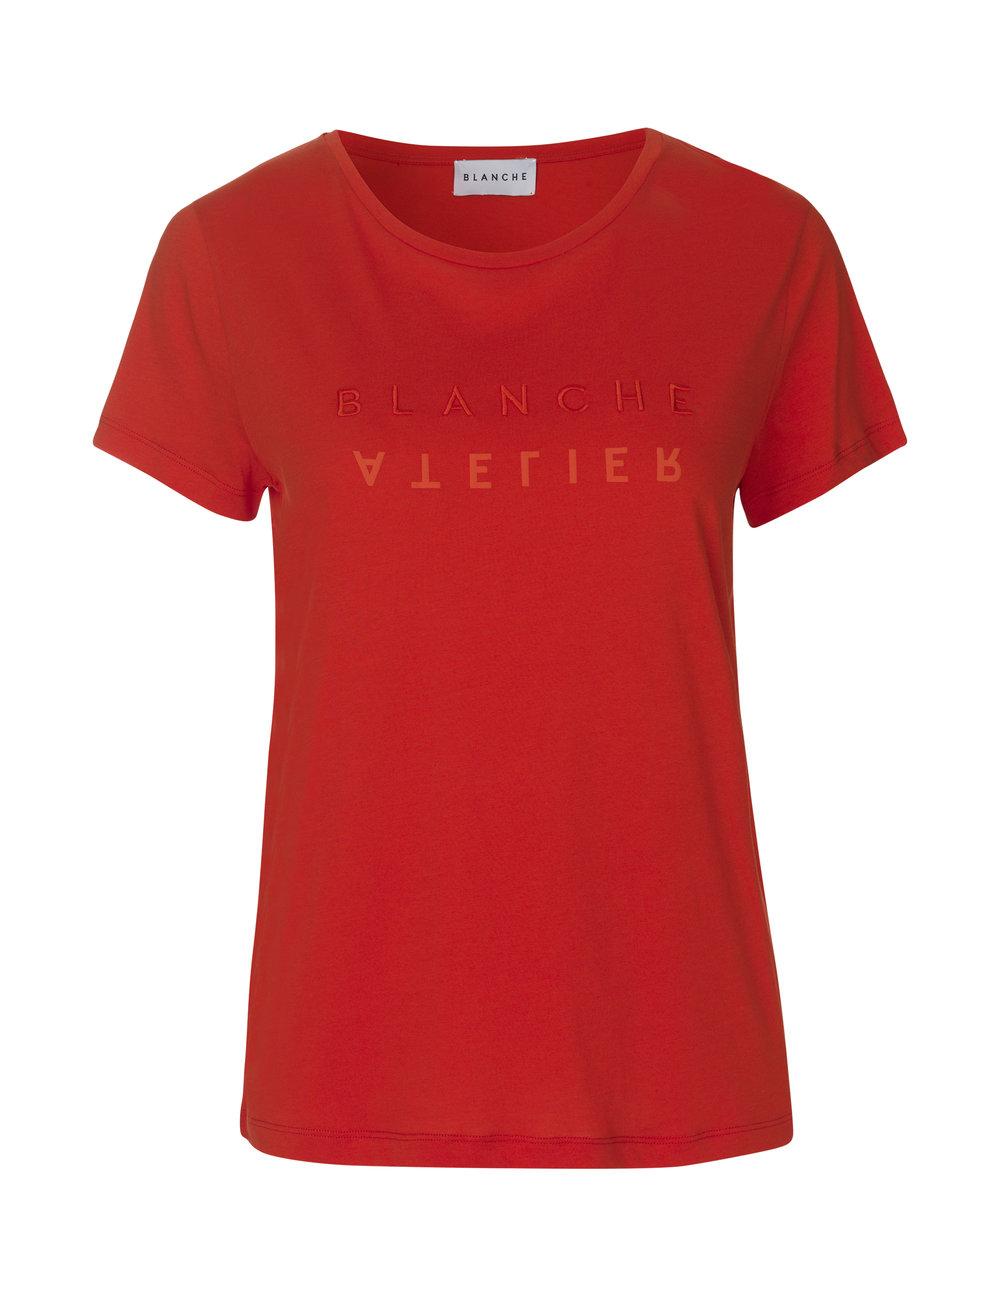 SS18_VelaTshirt_CherryPop.jpg